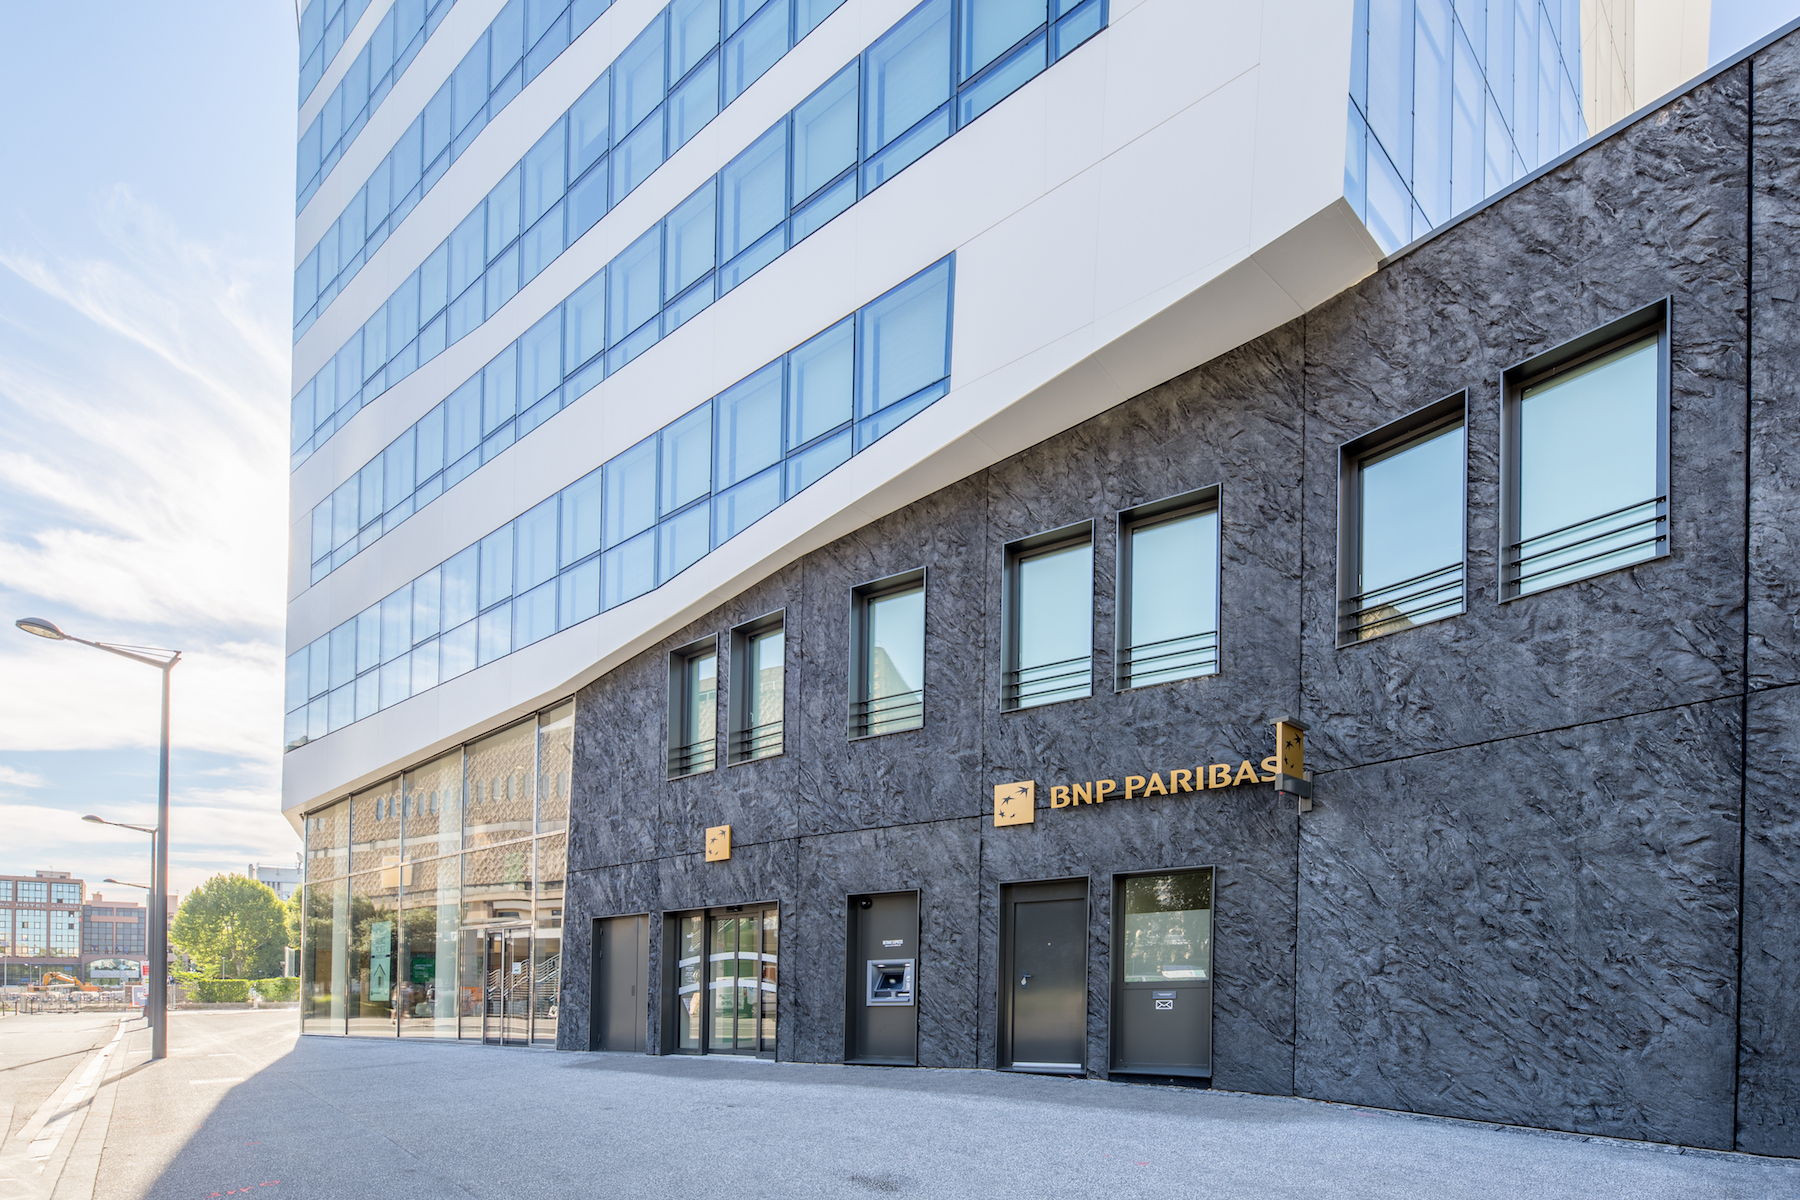 Agence BNP Paribas - Lyon Part-Dieu